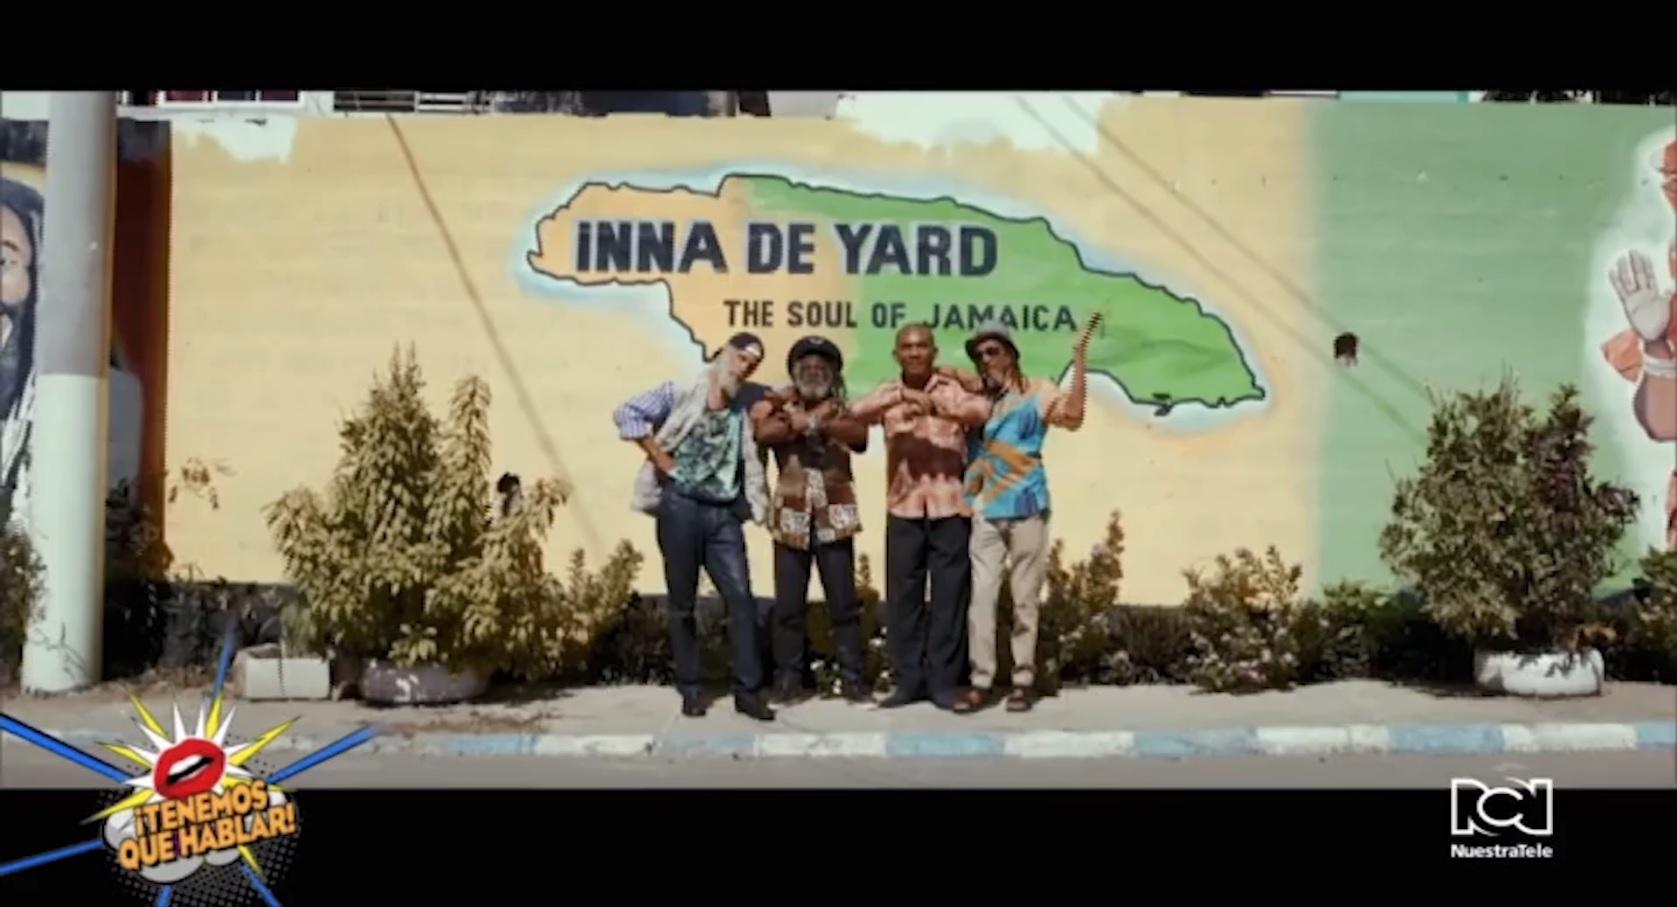 inna-de-yard-the-soul-of-jamaica.jpg